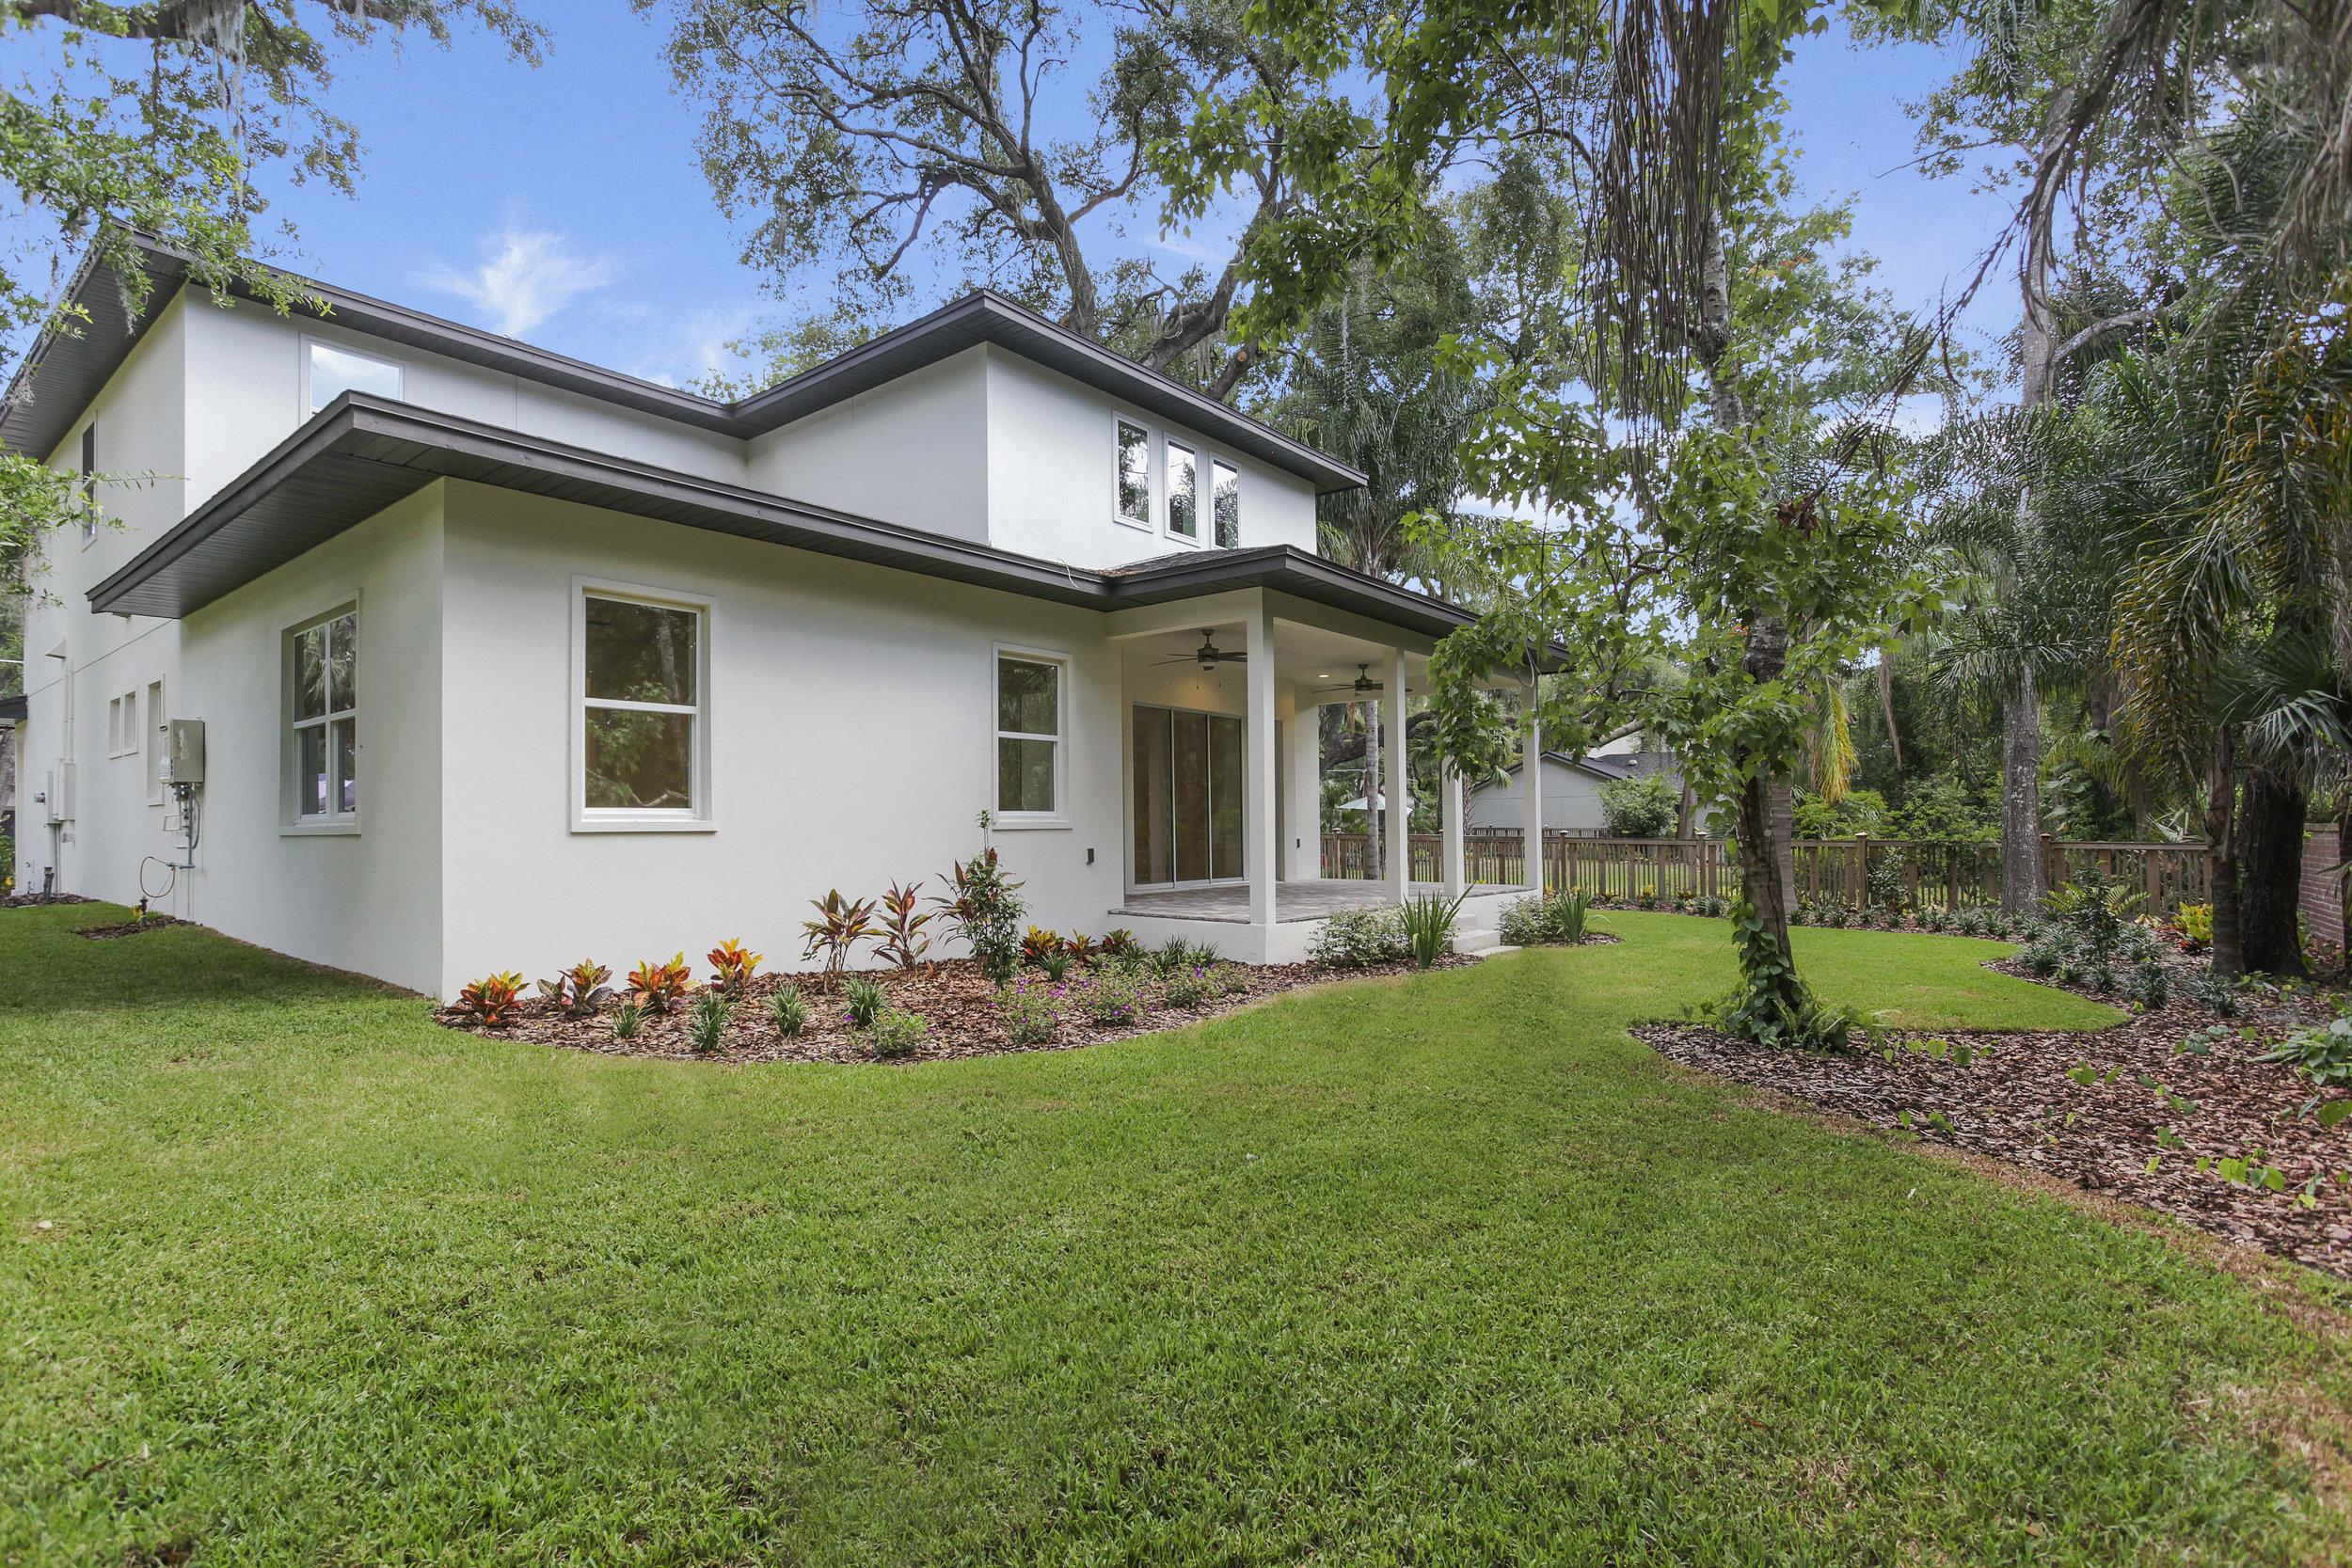 1008 Greenwood St, Orlando_IMG_5295b.jpg